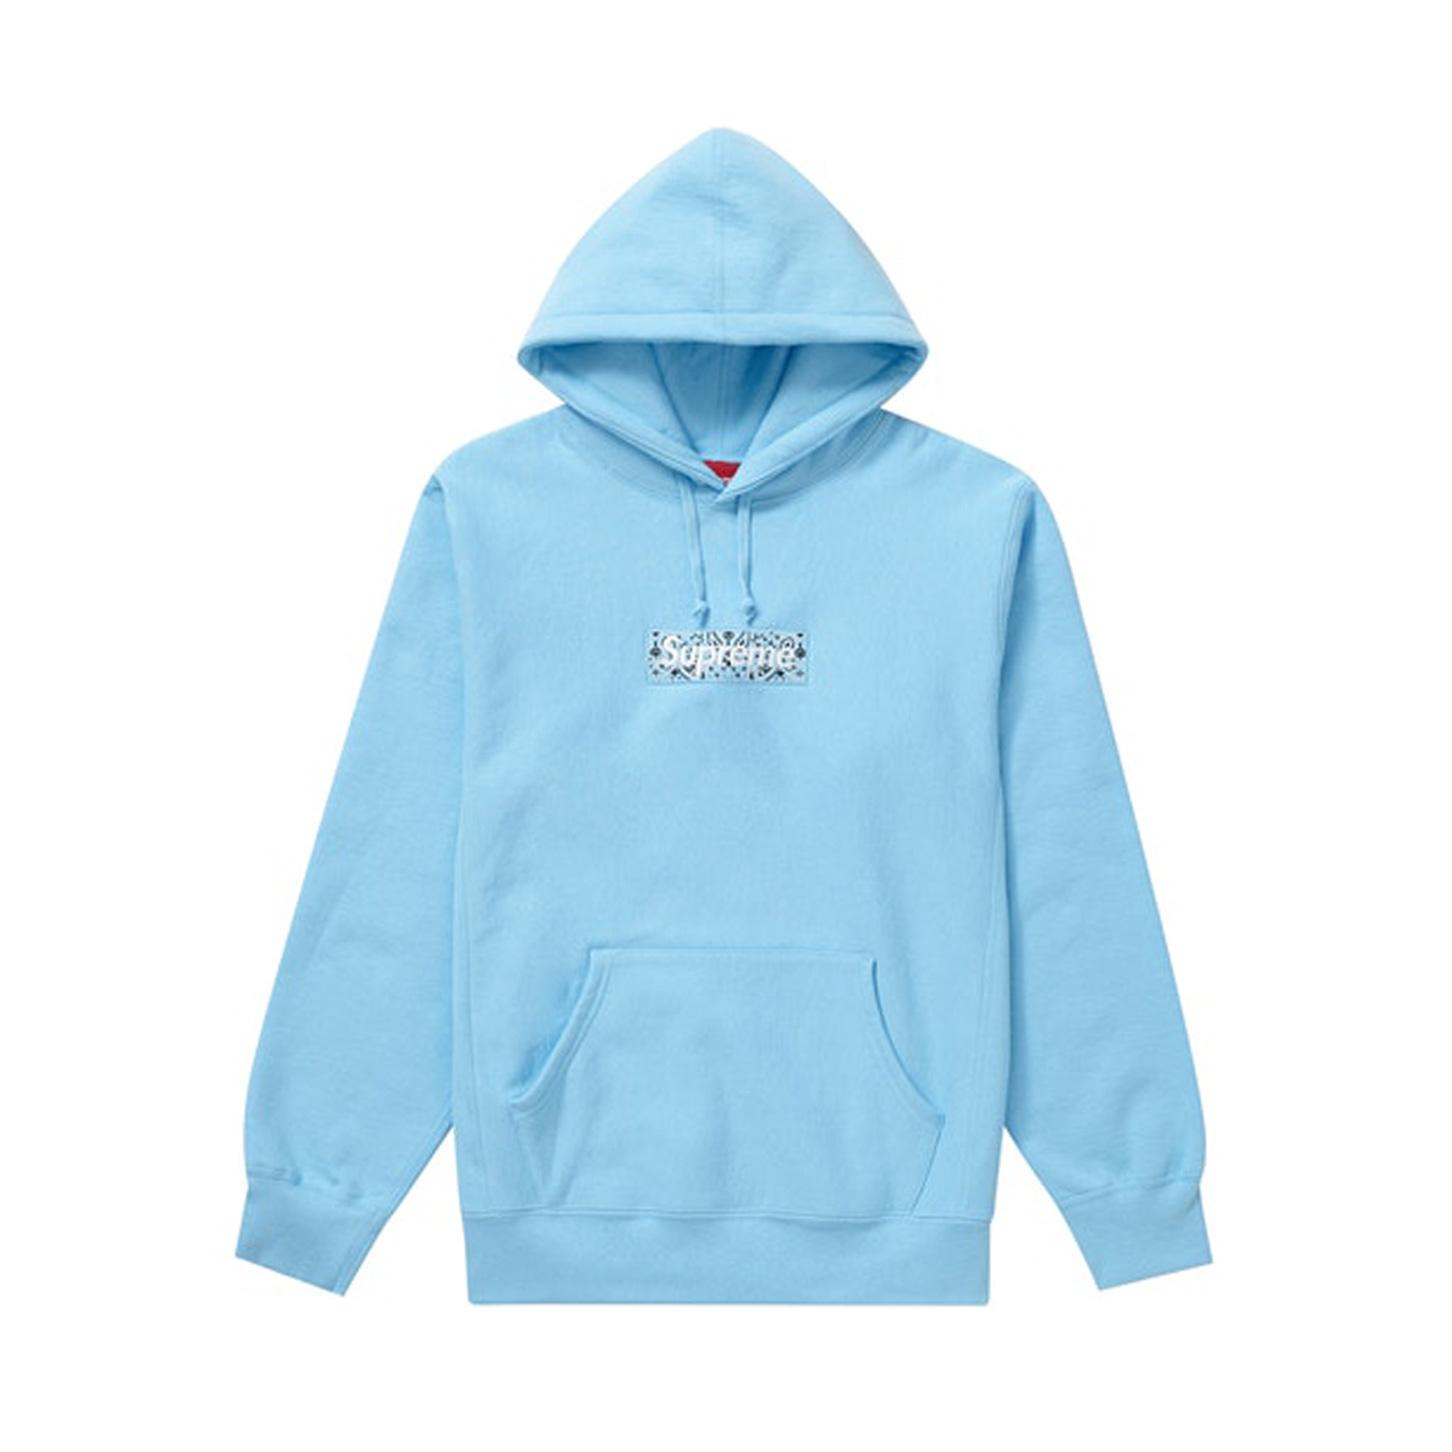 Supreme Bandana Box Logo Hooded Sweatshirt Light Blue 19FW